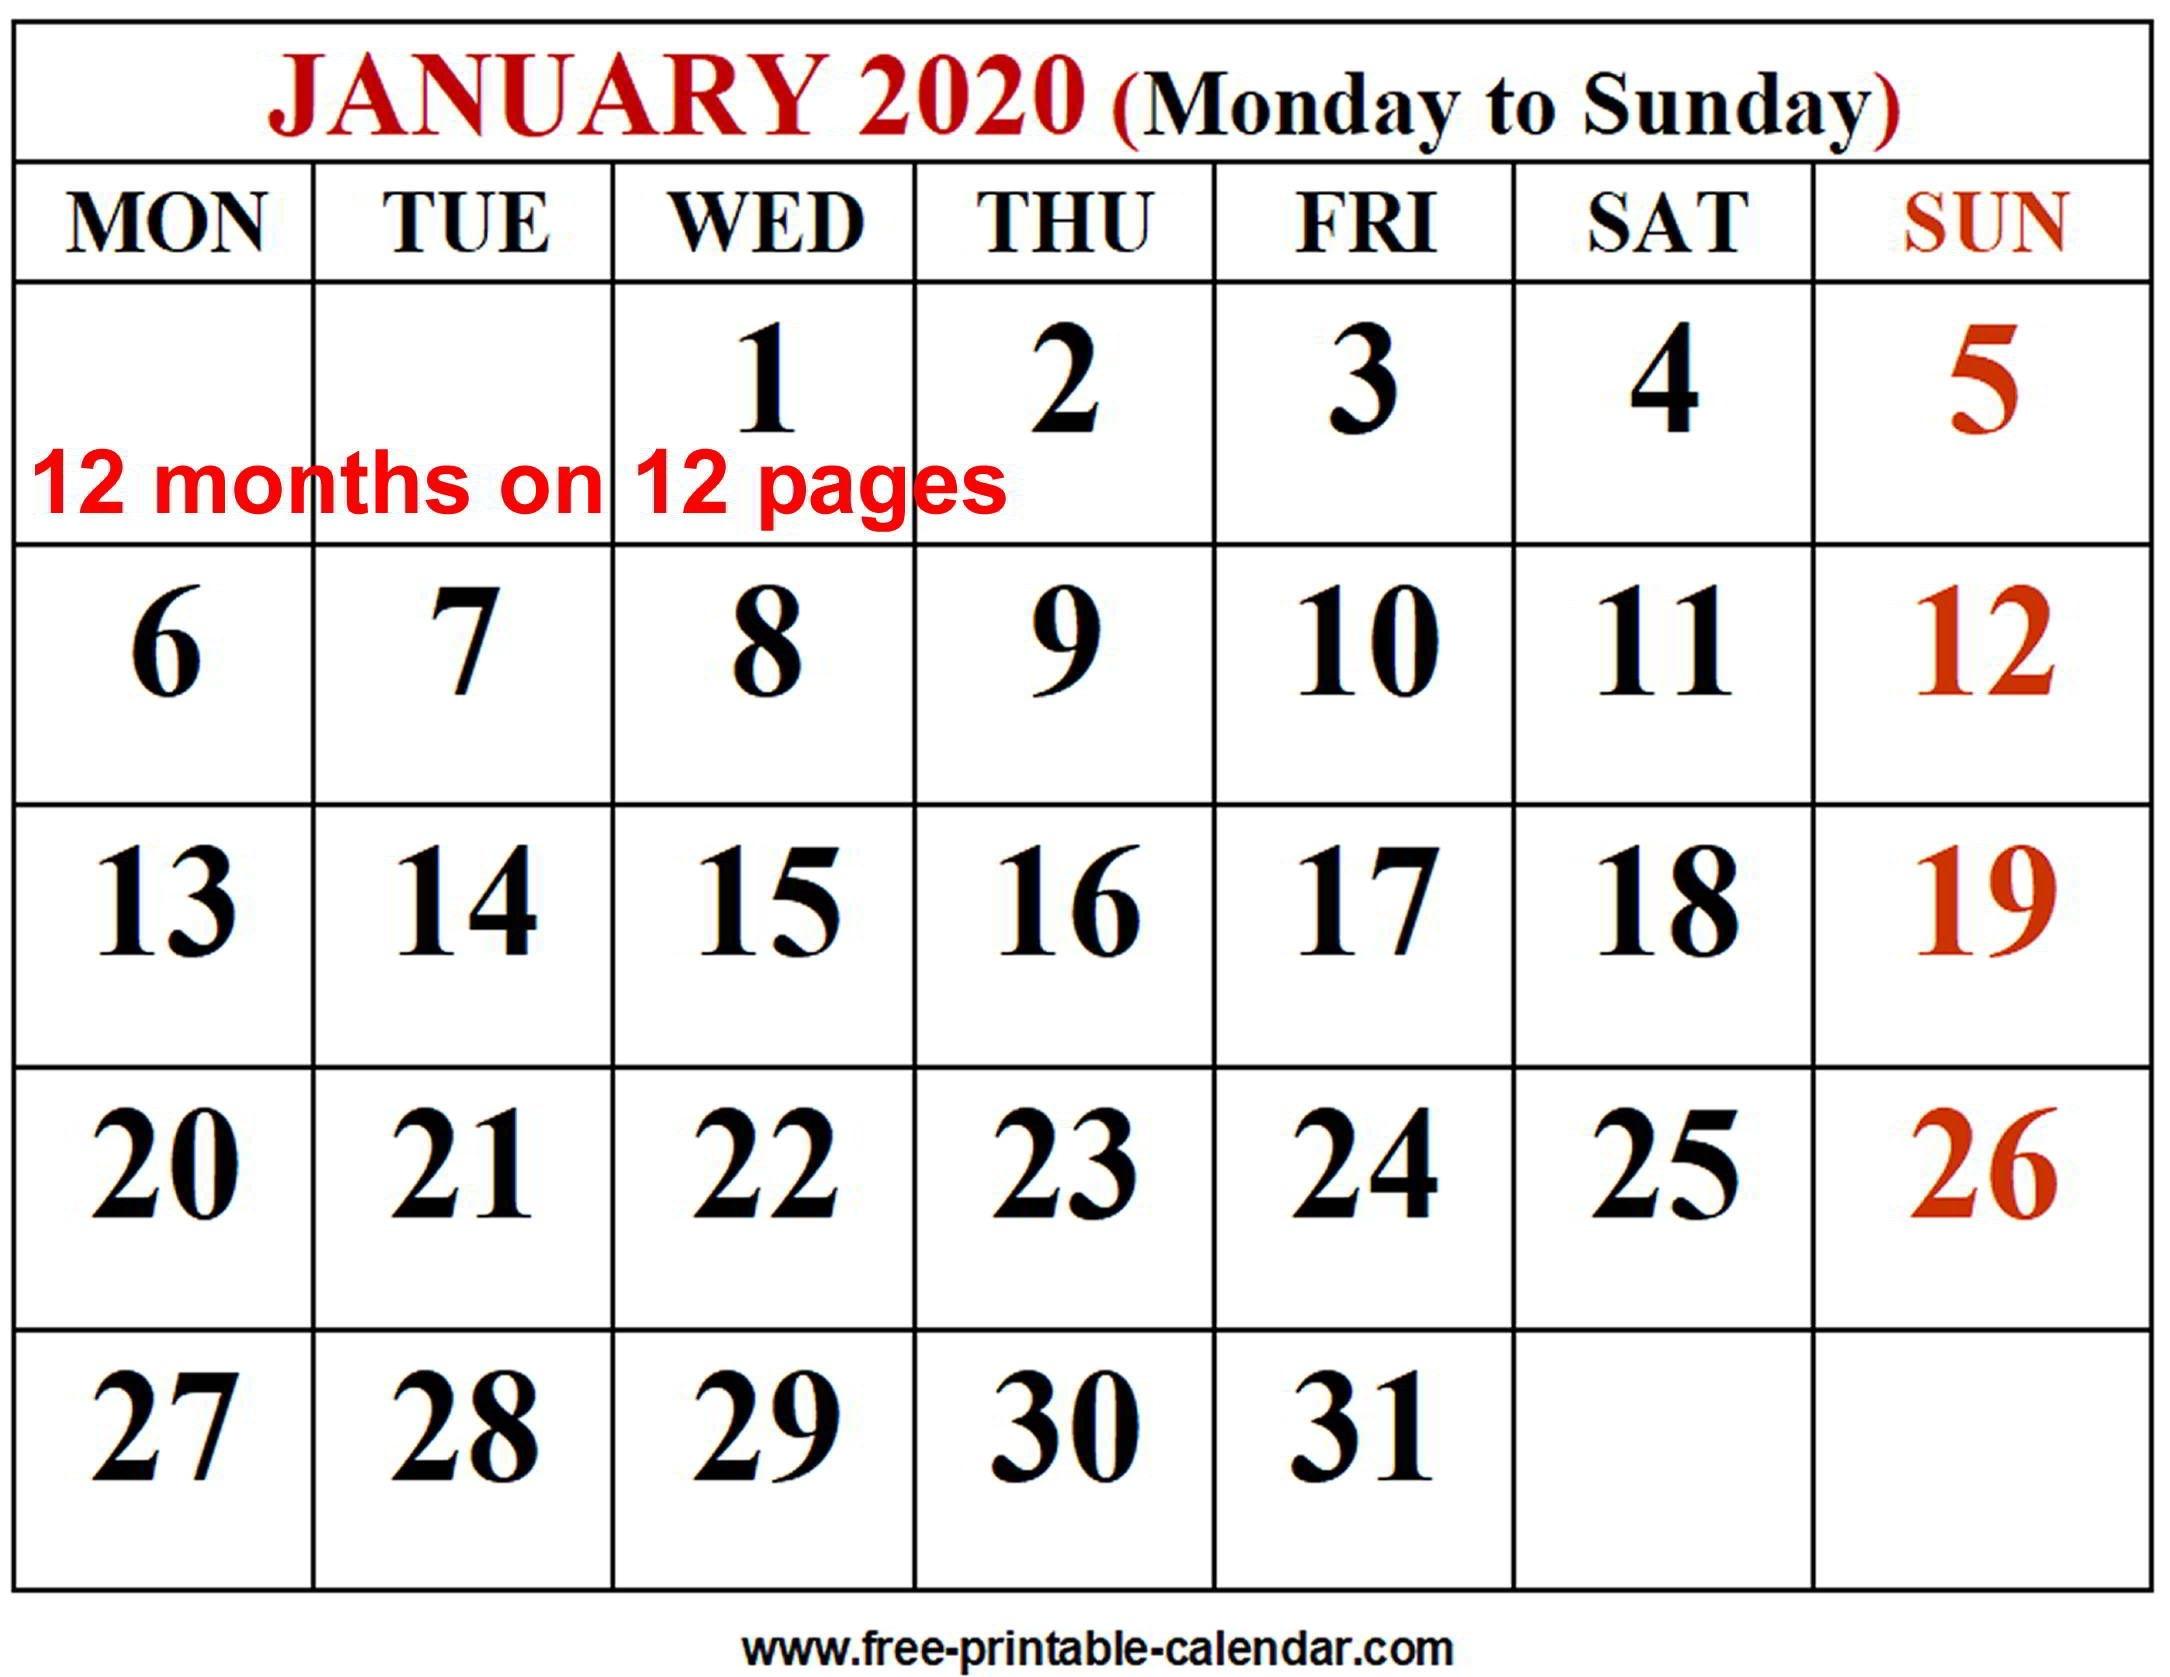 2020 Calendar Template - Free-Printable-Calendar